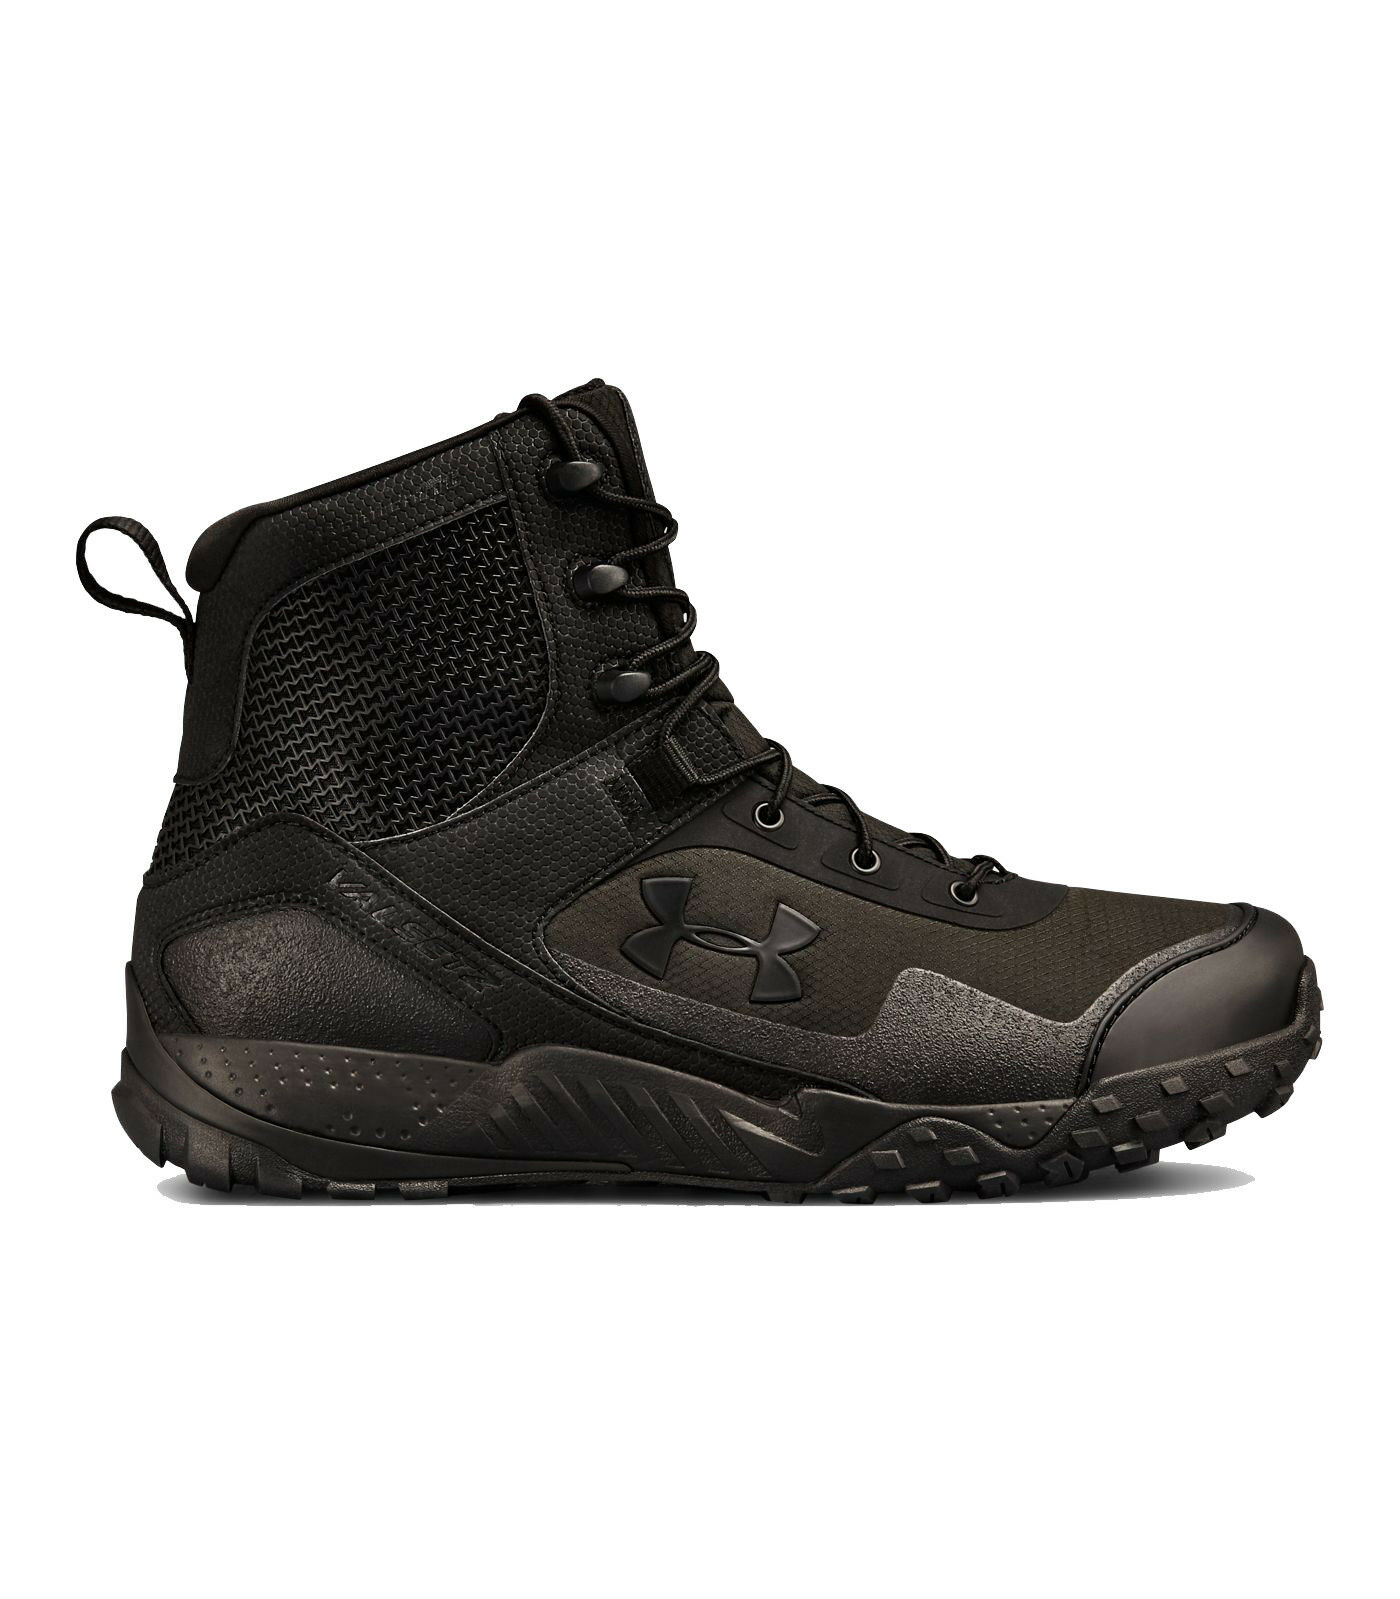 Men's Tony Lama Brown Leather Cowboy Western Boots sz: 9 D (X )